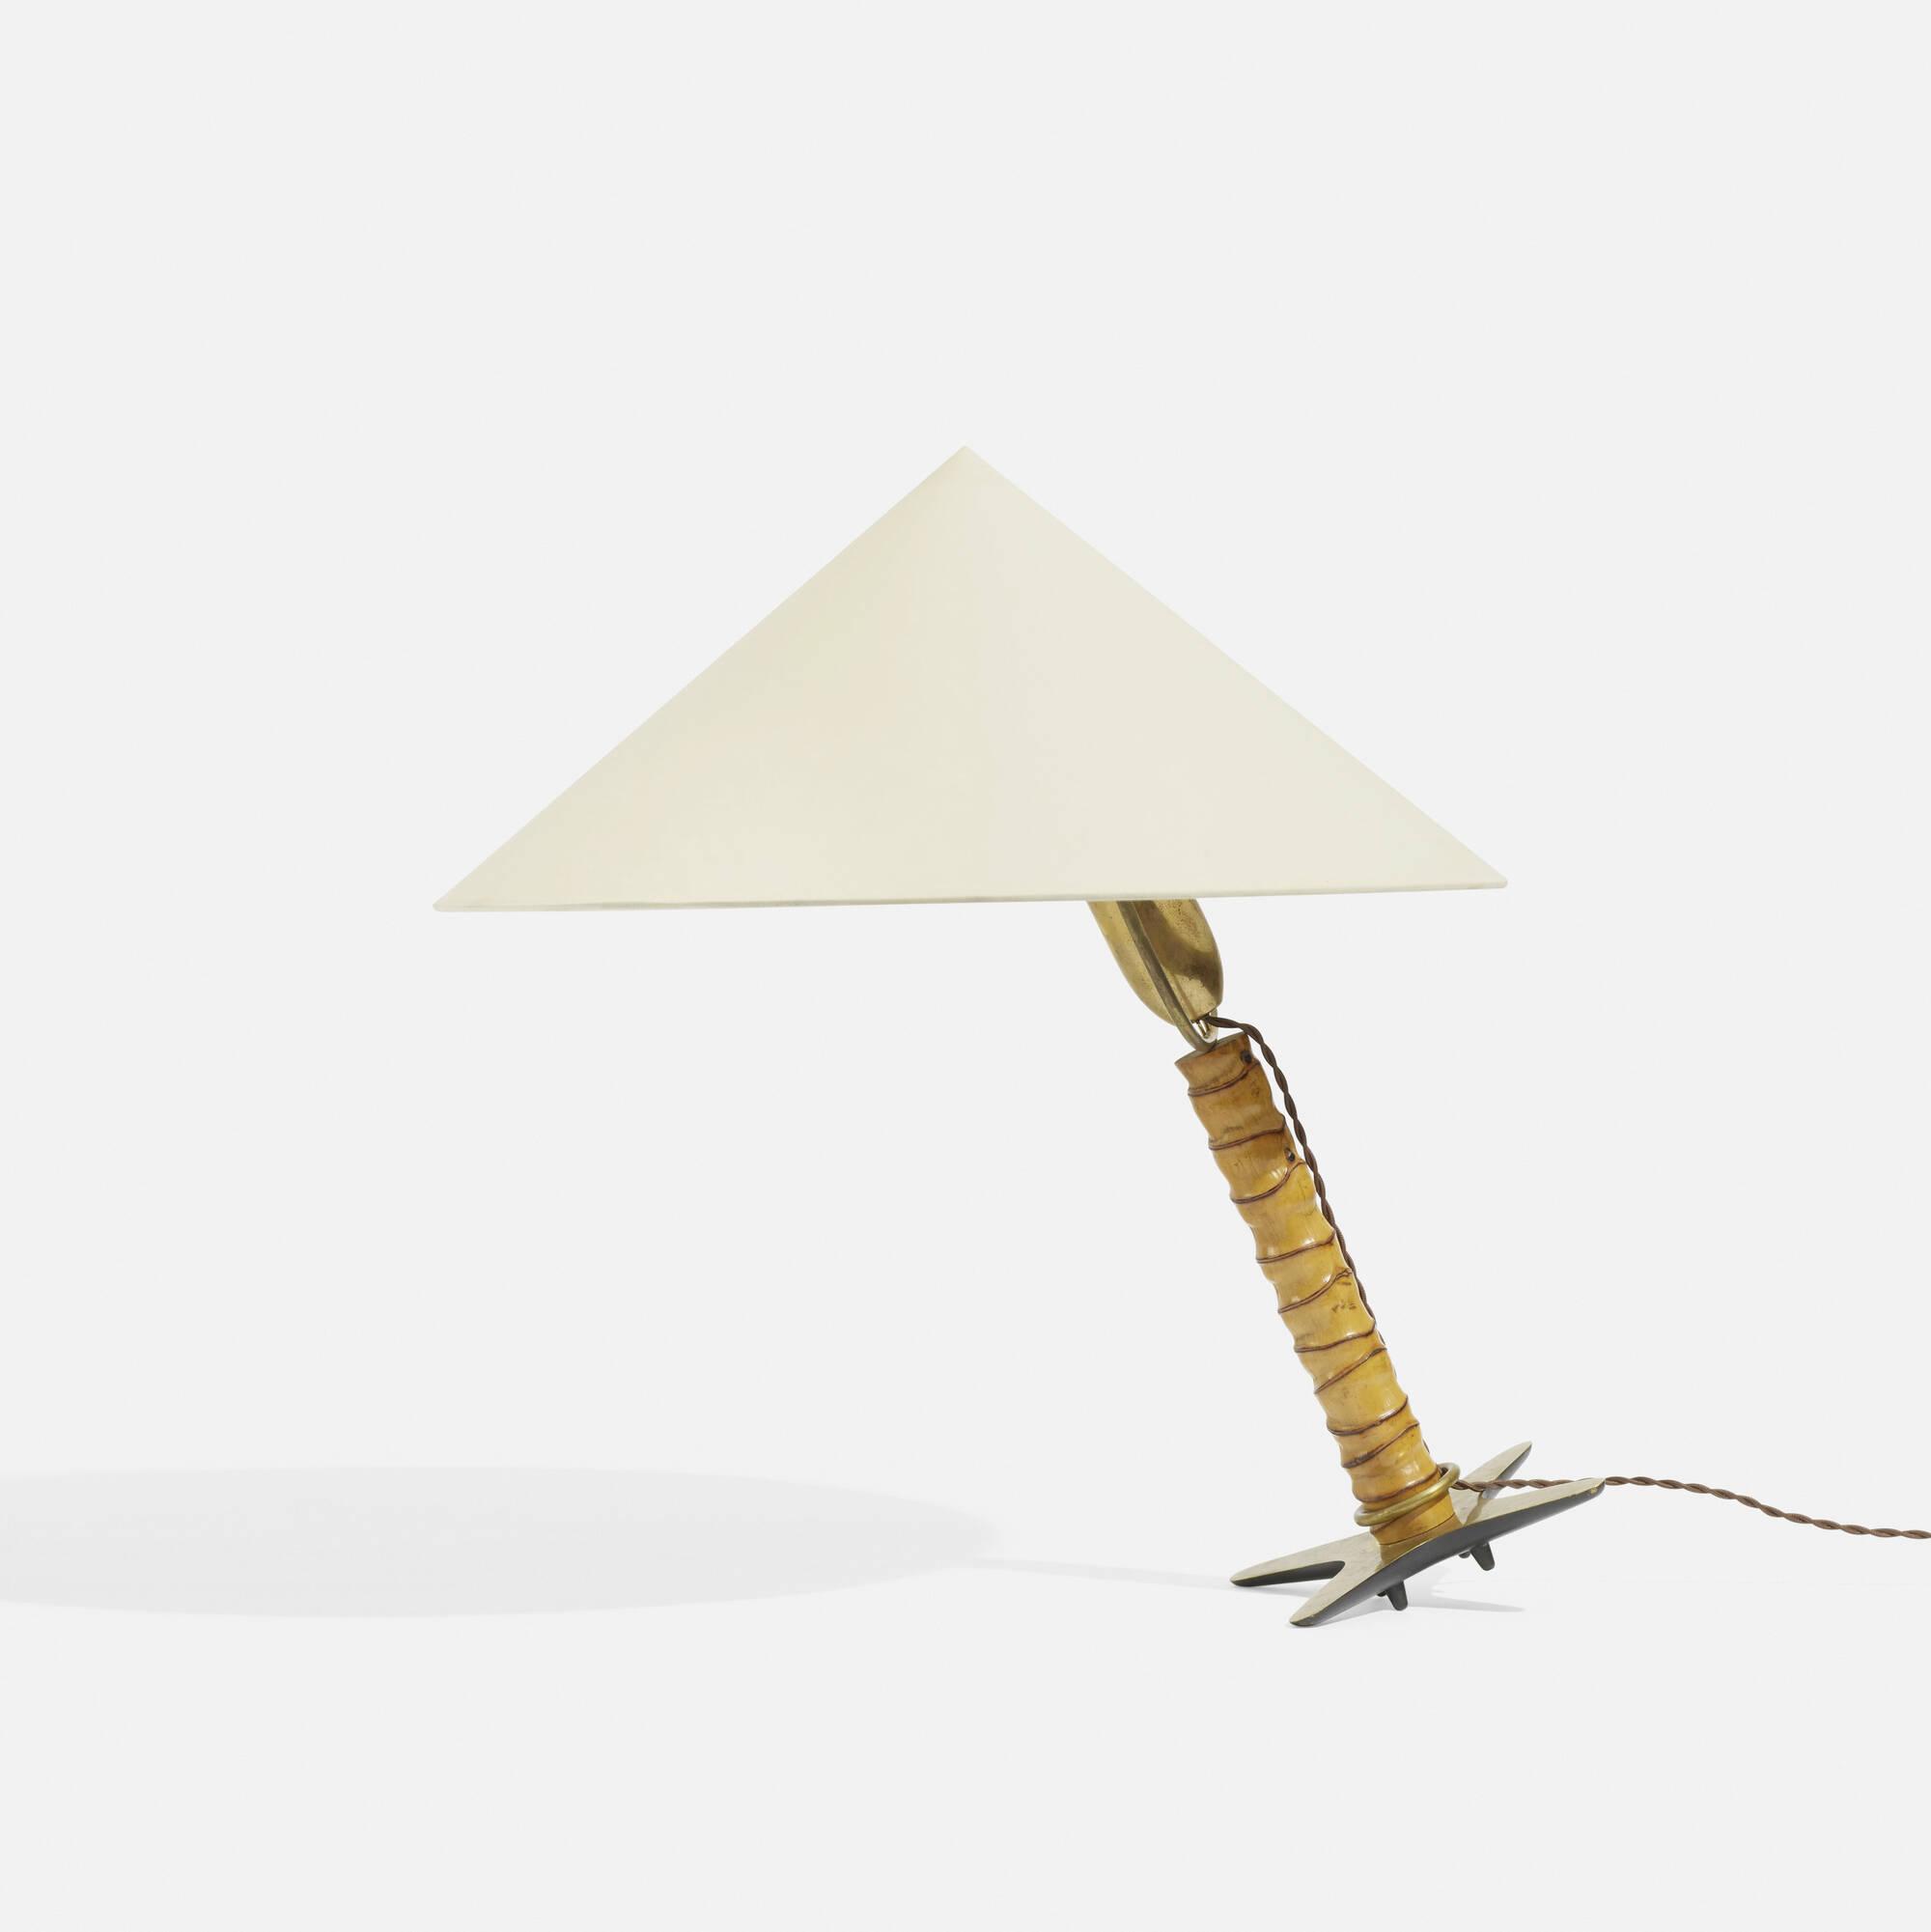 140: Carl Auböck II / table lamp (1 of 3)